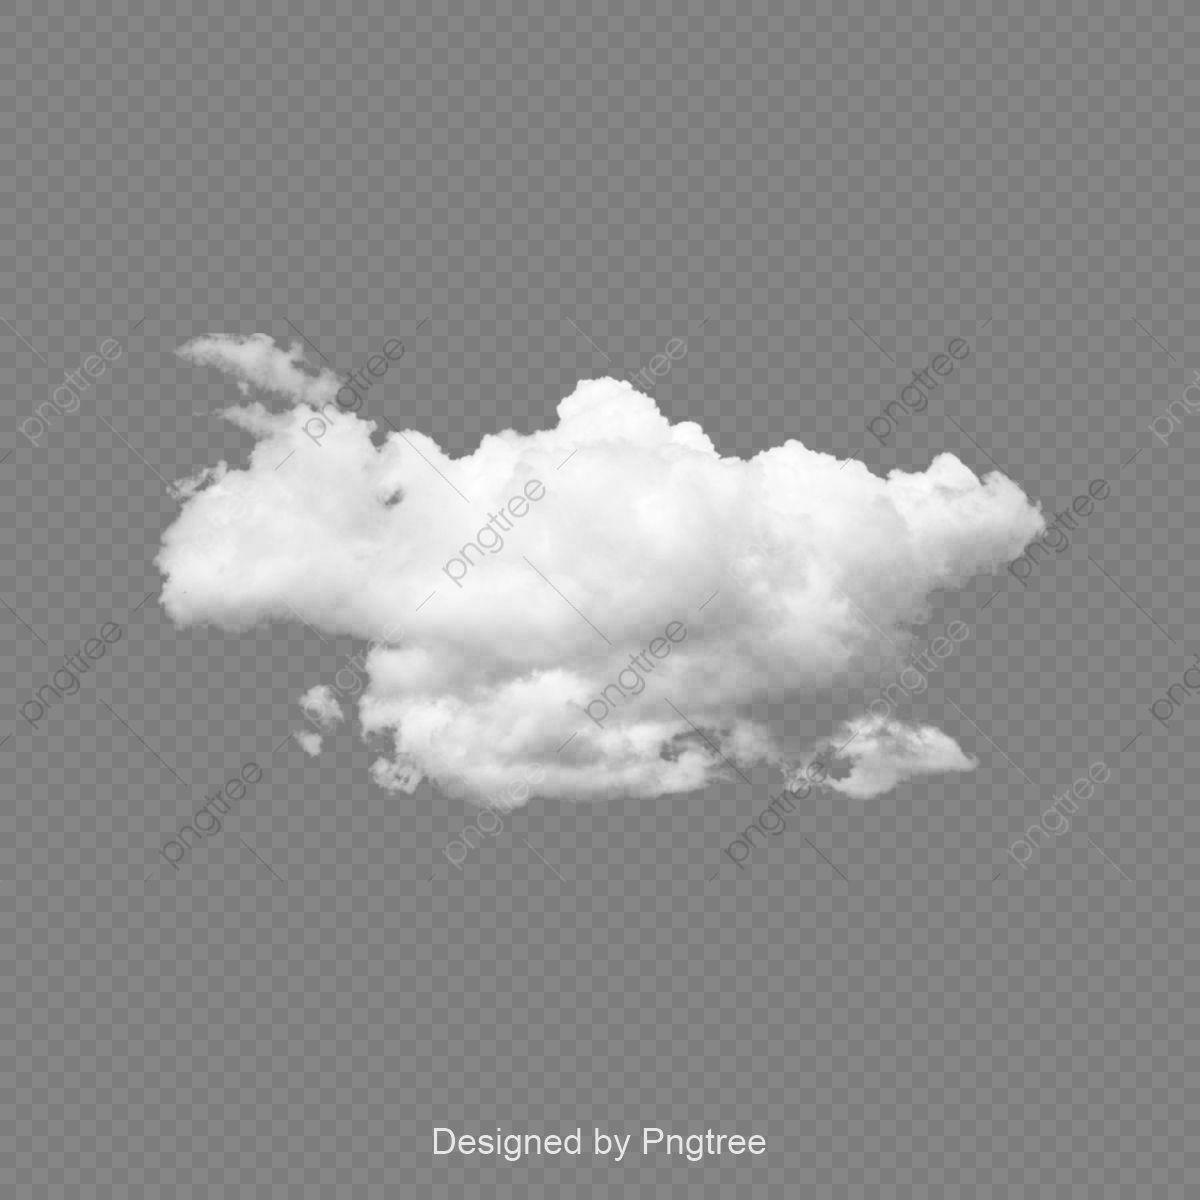 Nuvem Verdadeira Nuvem Verdadeira Nuvem Branca Fundo Cinza Imagem Png E Psd Para Download Gratuito Clouds Clipart Images Gray Background